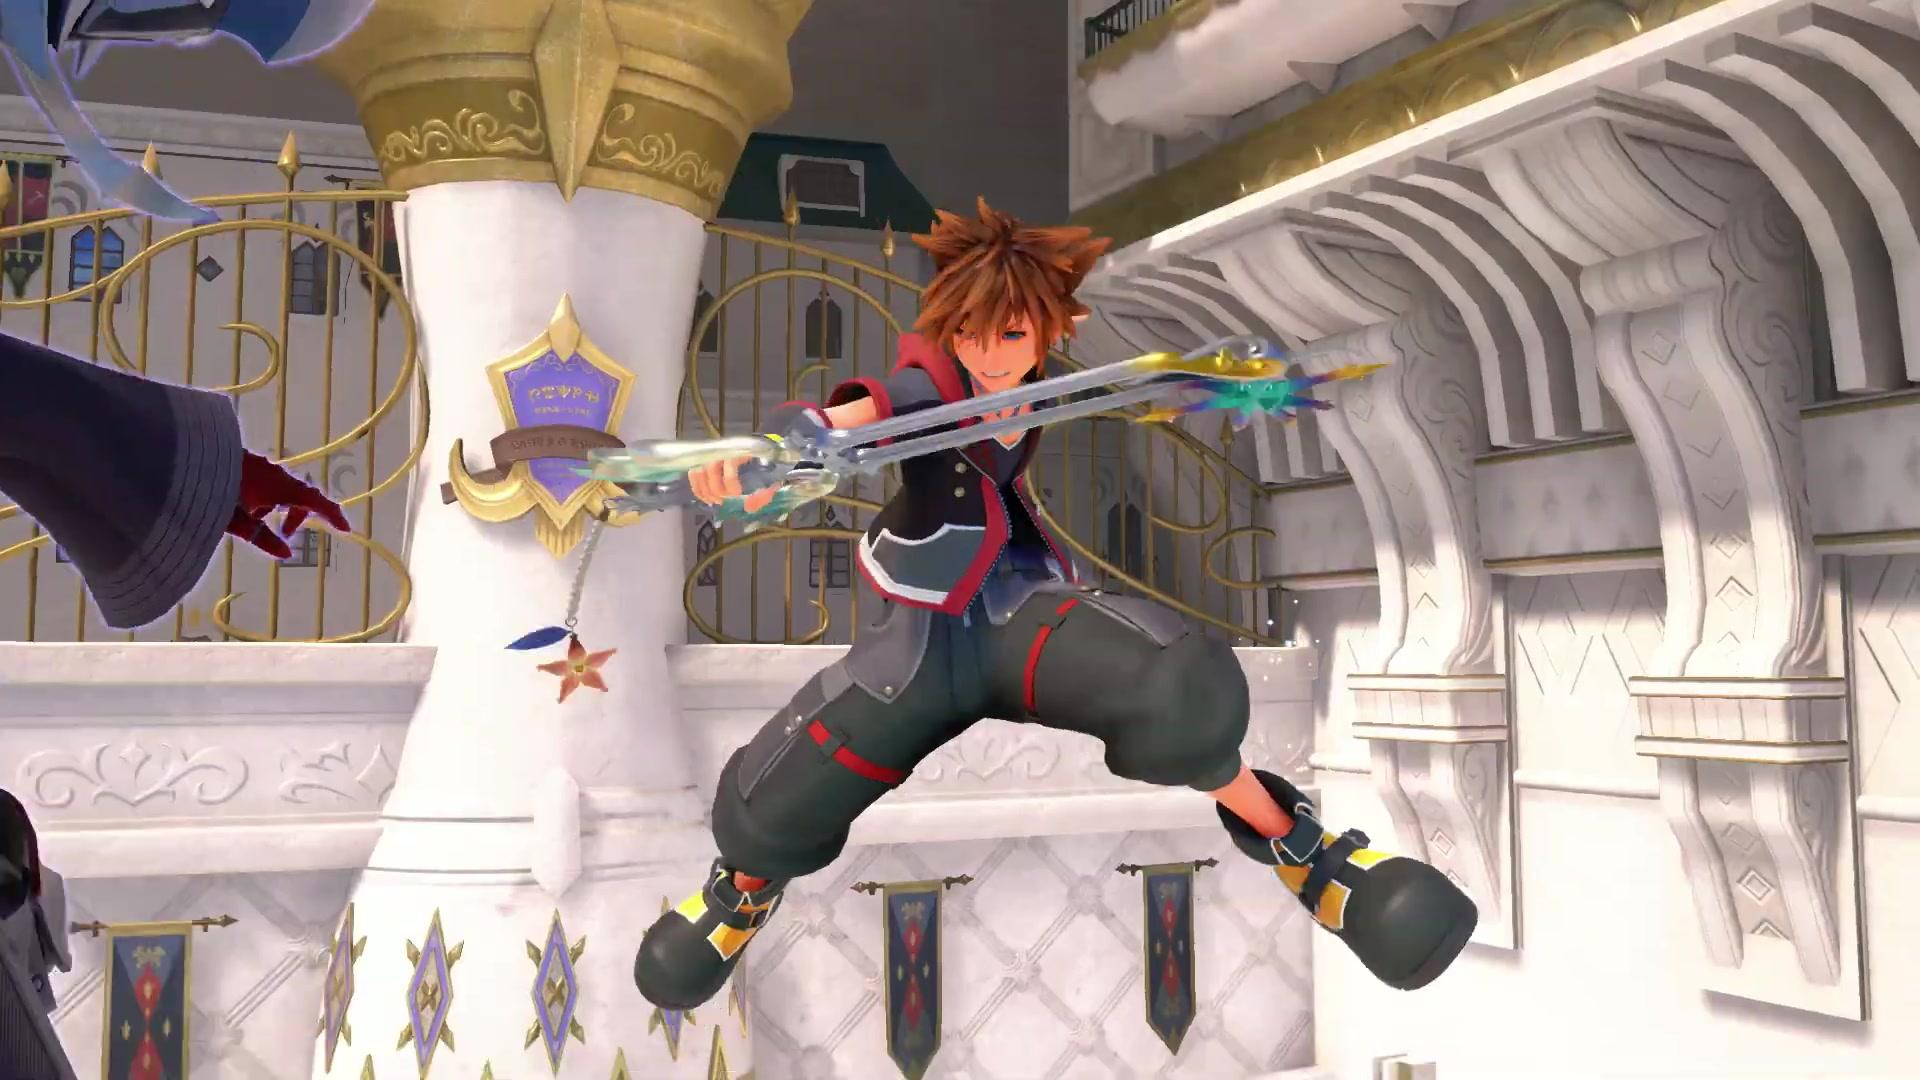 Square Enix will be showing off Kingdom Hearts 3's DLC next week screenshot